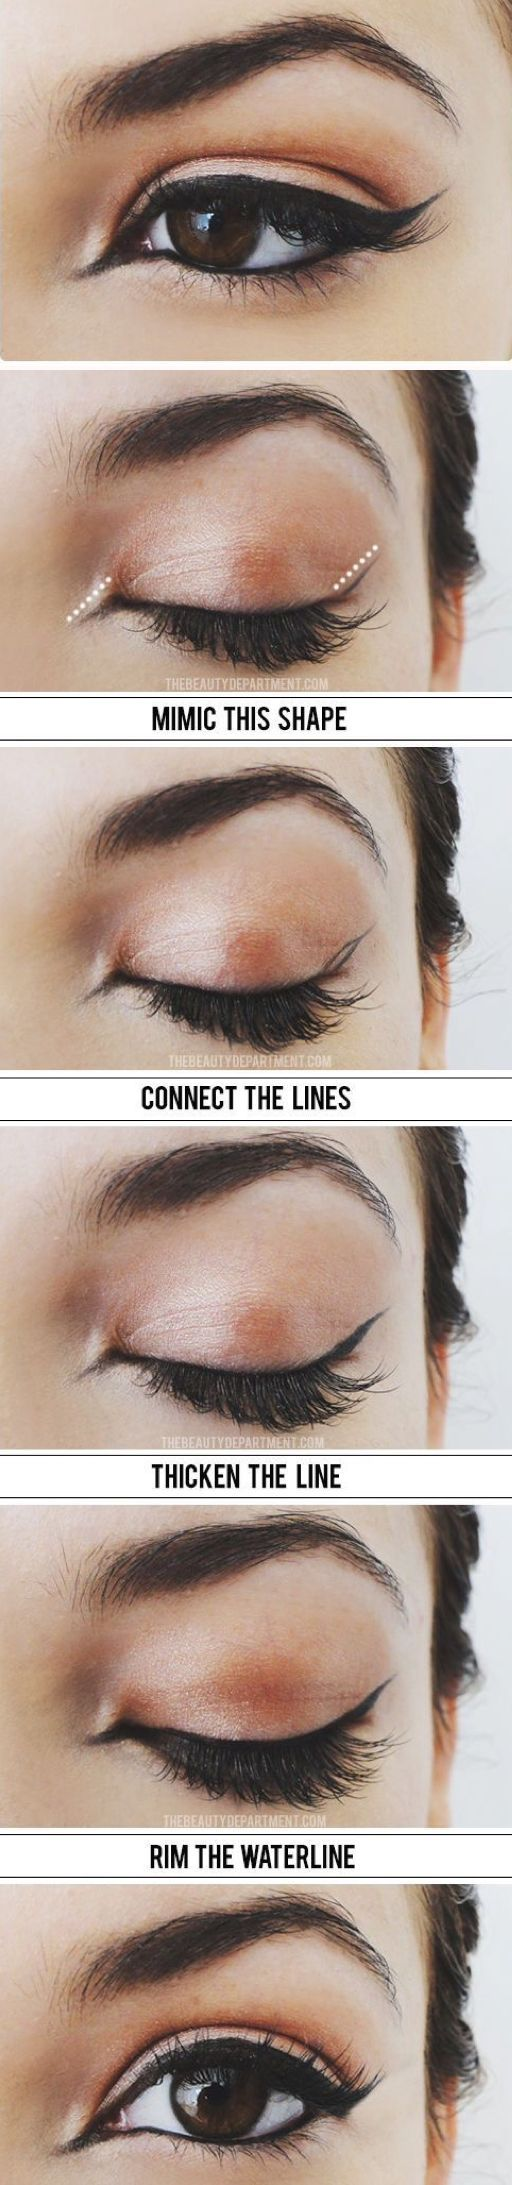 best 25+ how to cat eye ideas on pinterest | cat eye, cat eye how